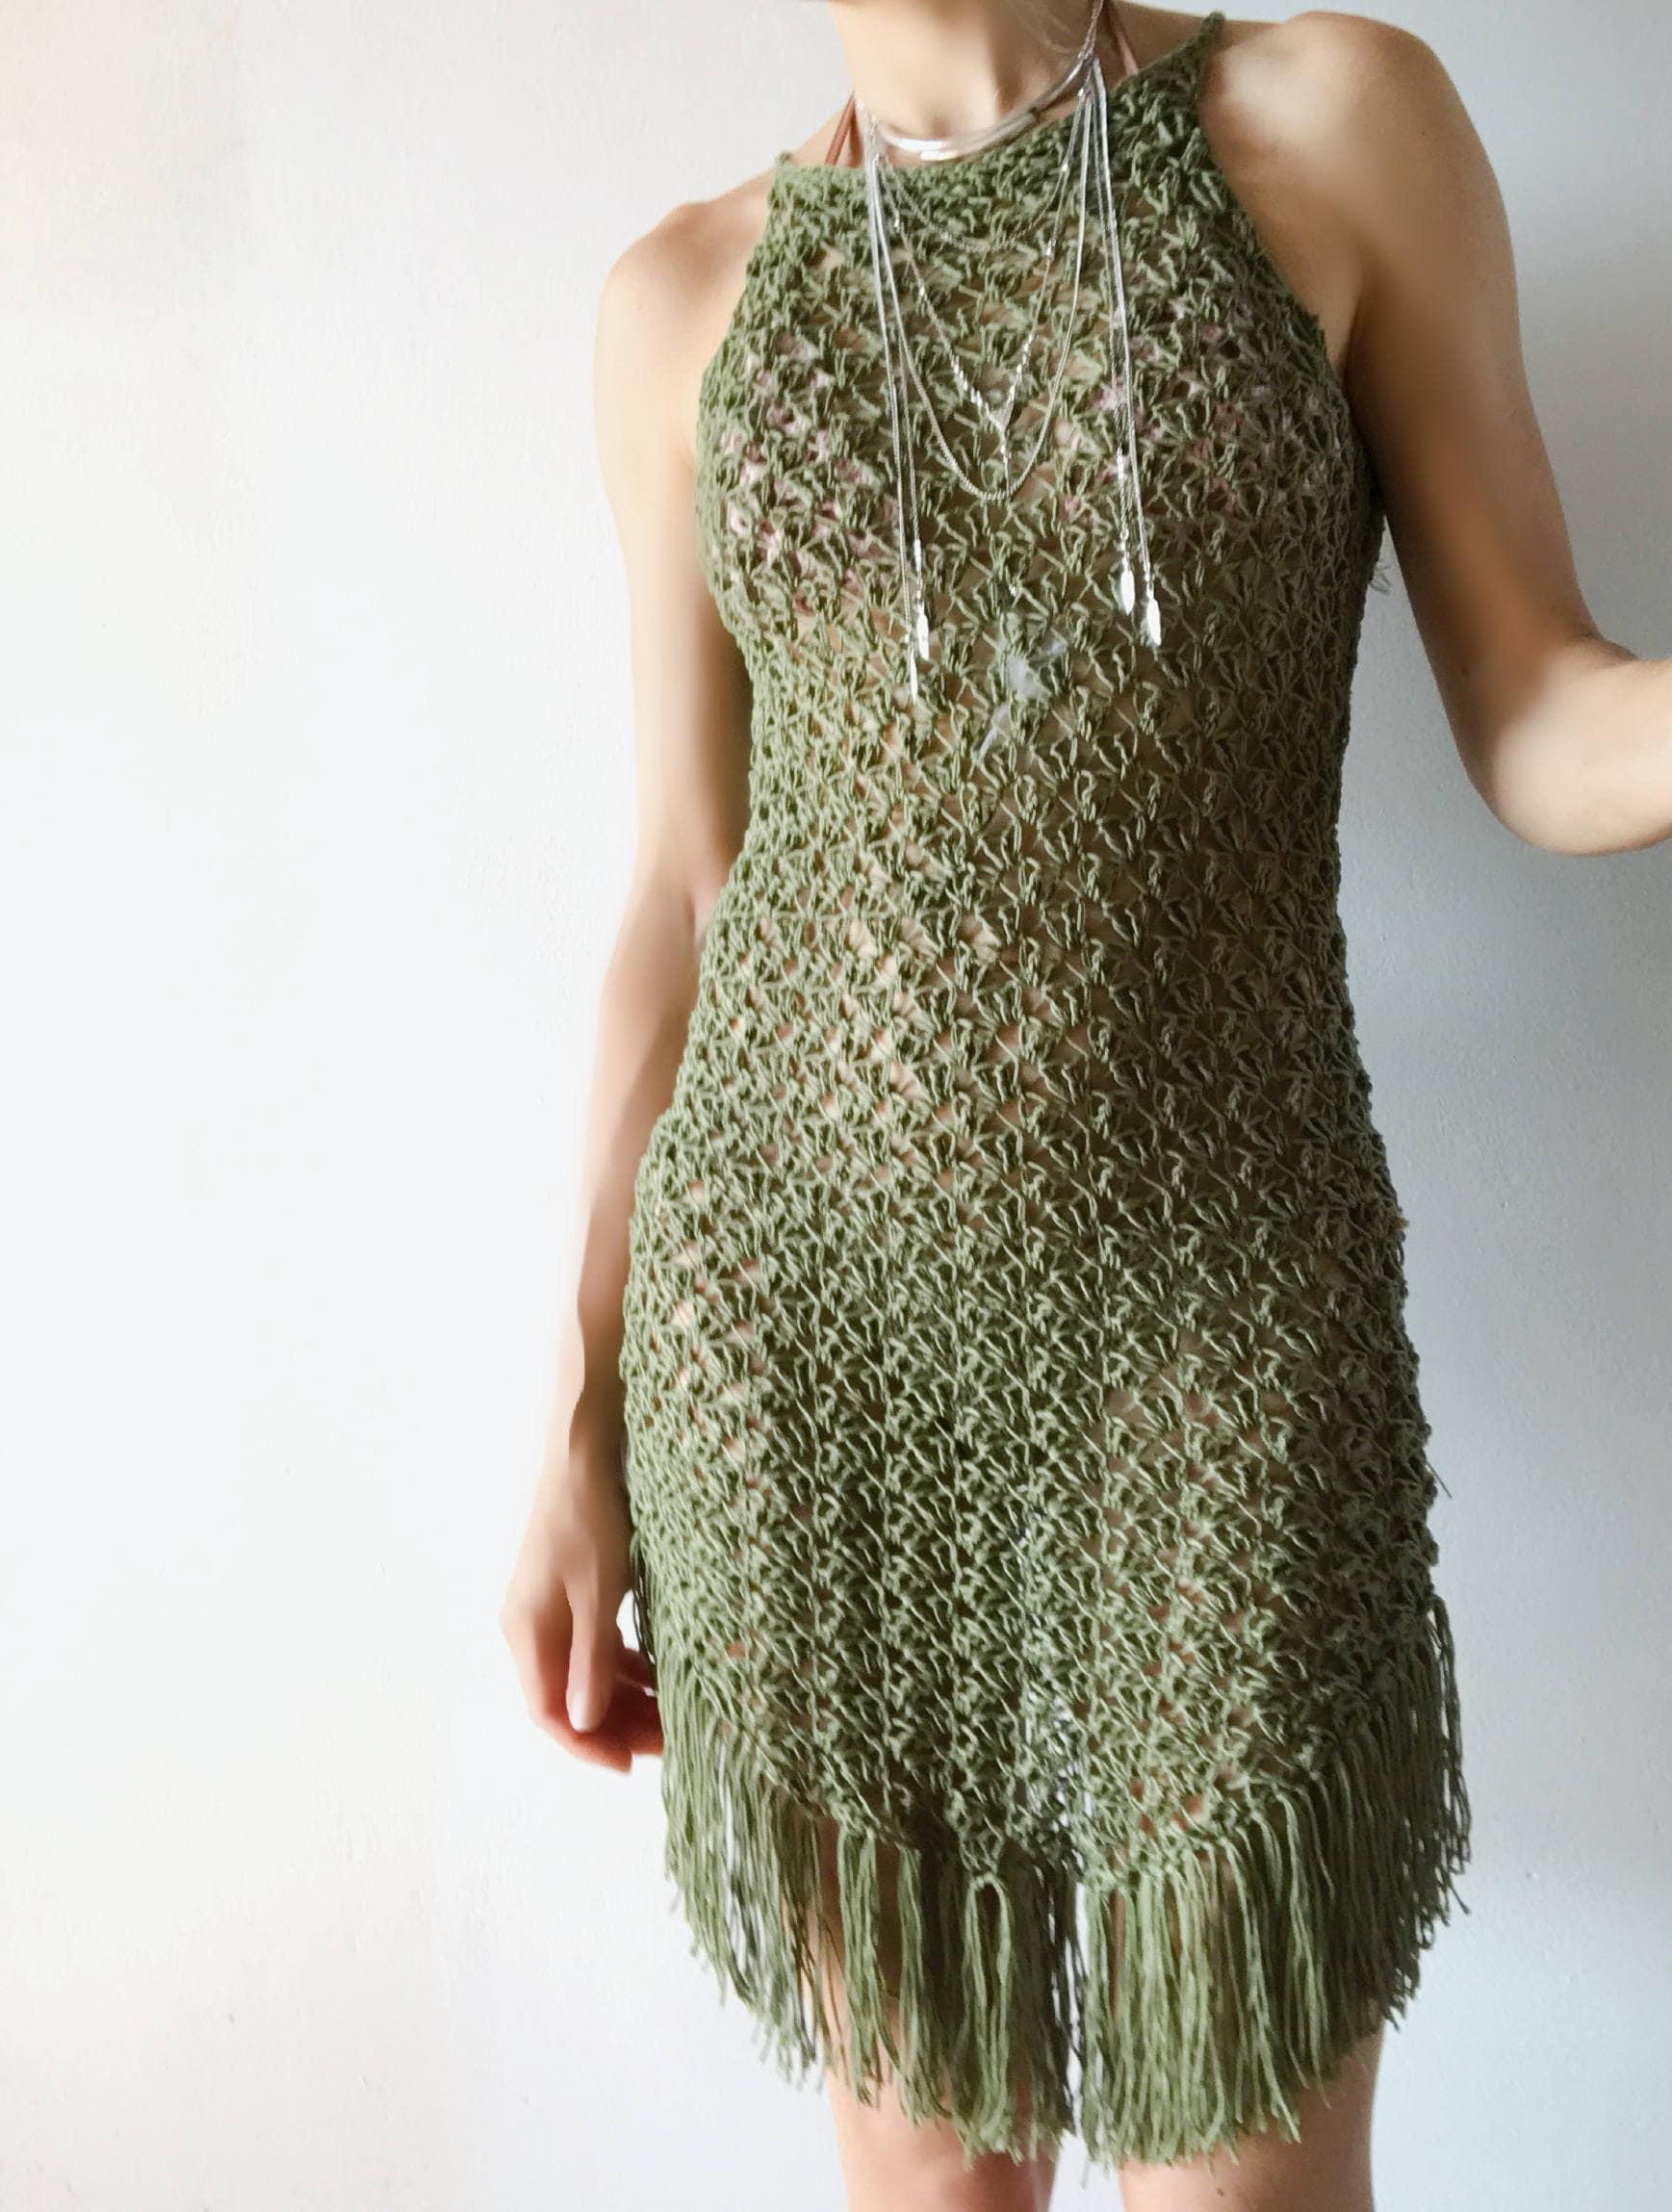 Crochet Xxl Patterns : PDF-file for Crochet PATTERN, Minerva Crochet Tunic Dress ...